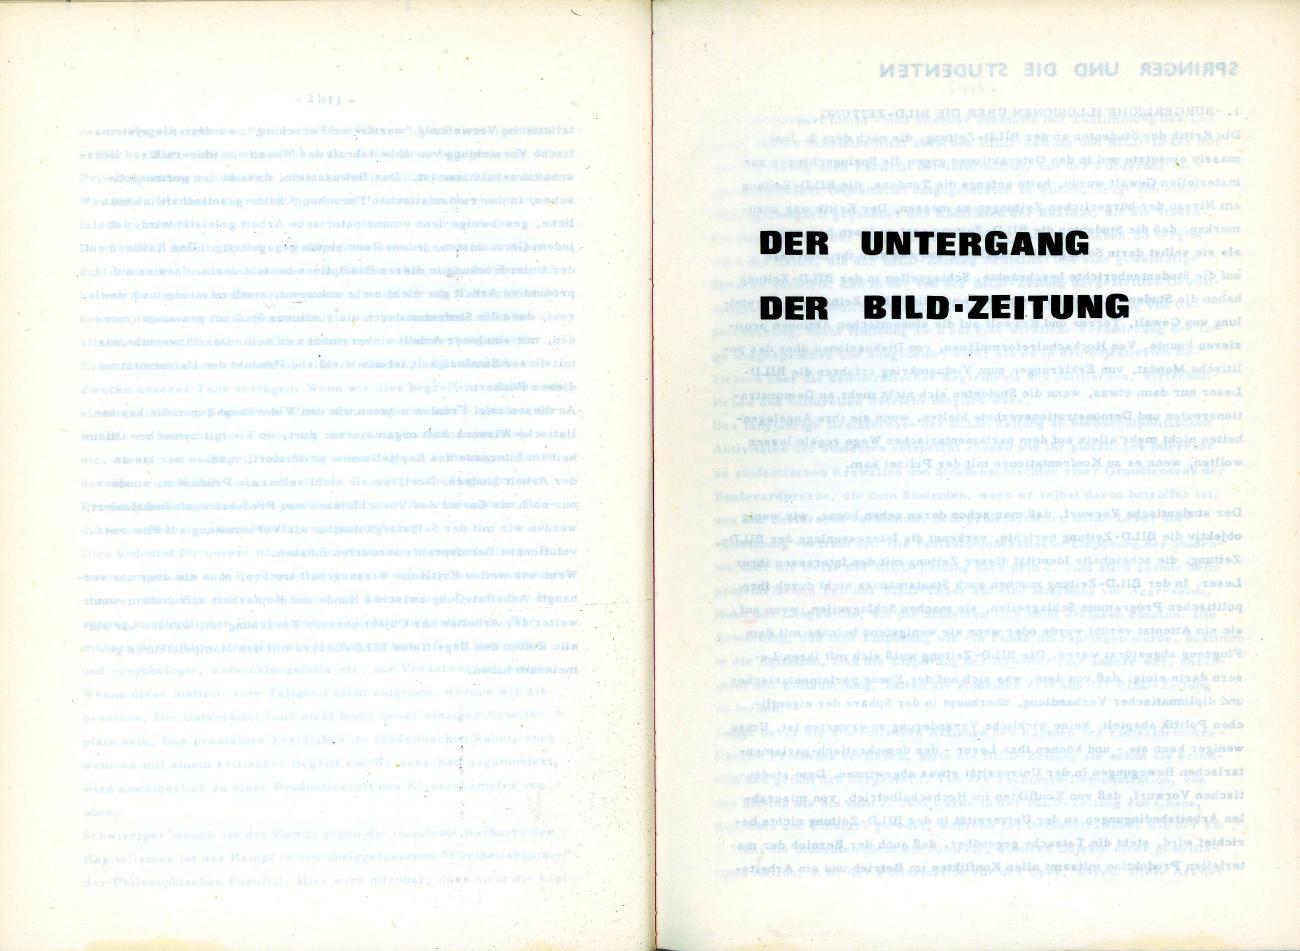 Berlin_SDS_1969_Bildzeitung_66